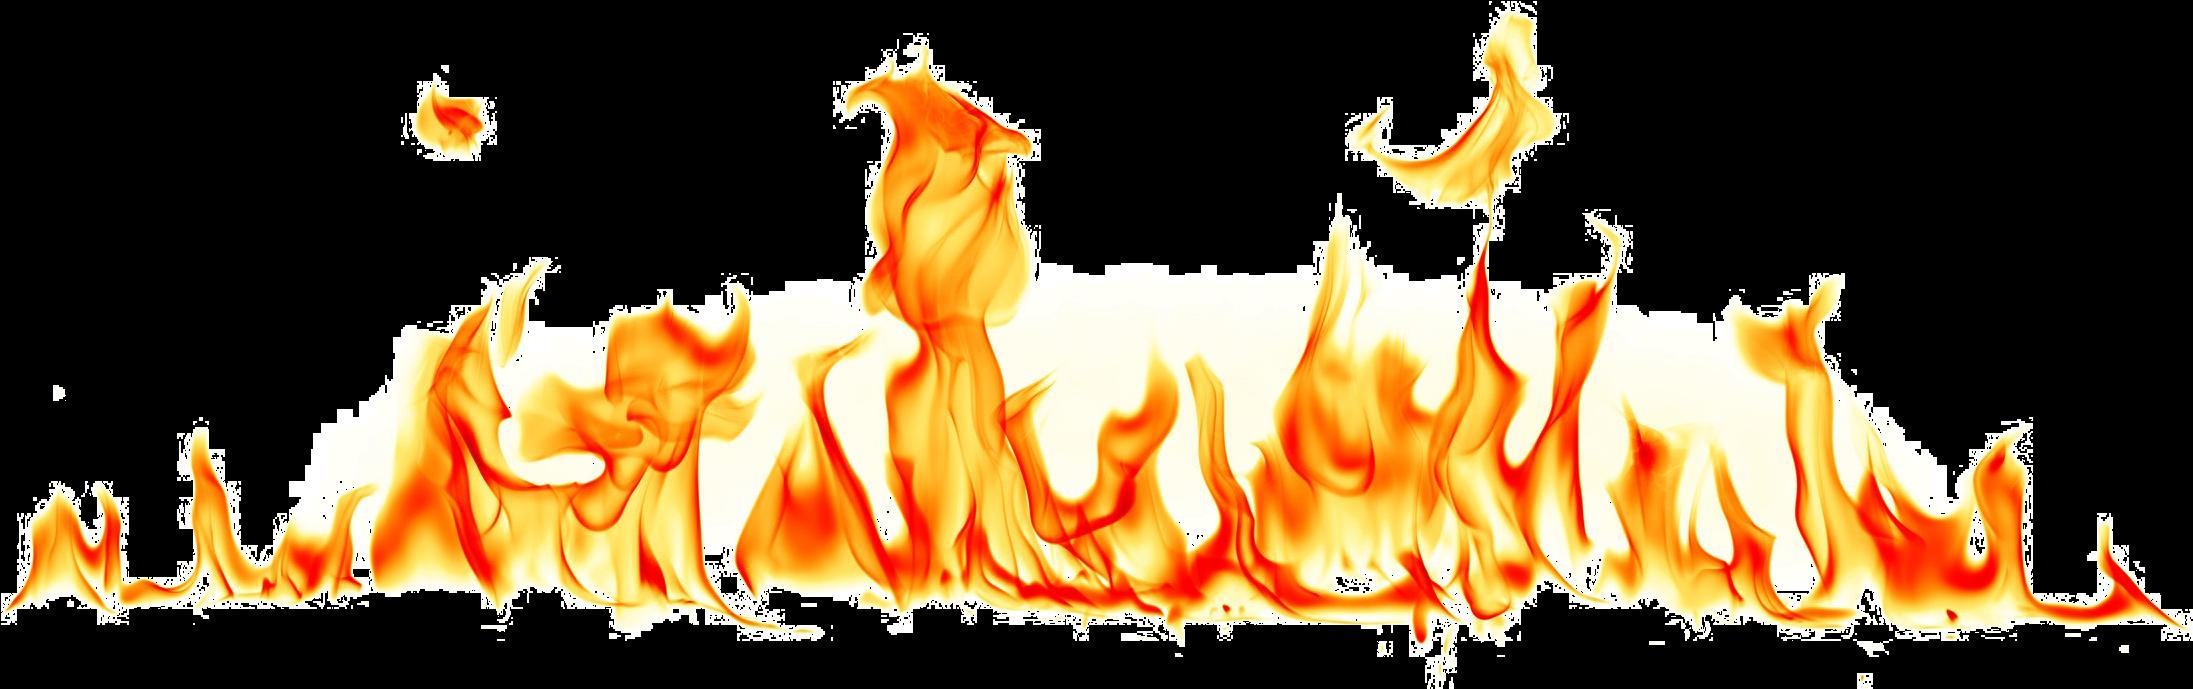 HD Hot Fire Png Photo.